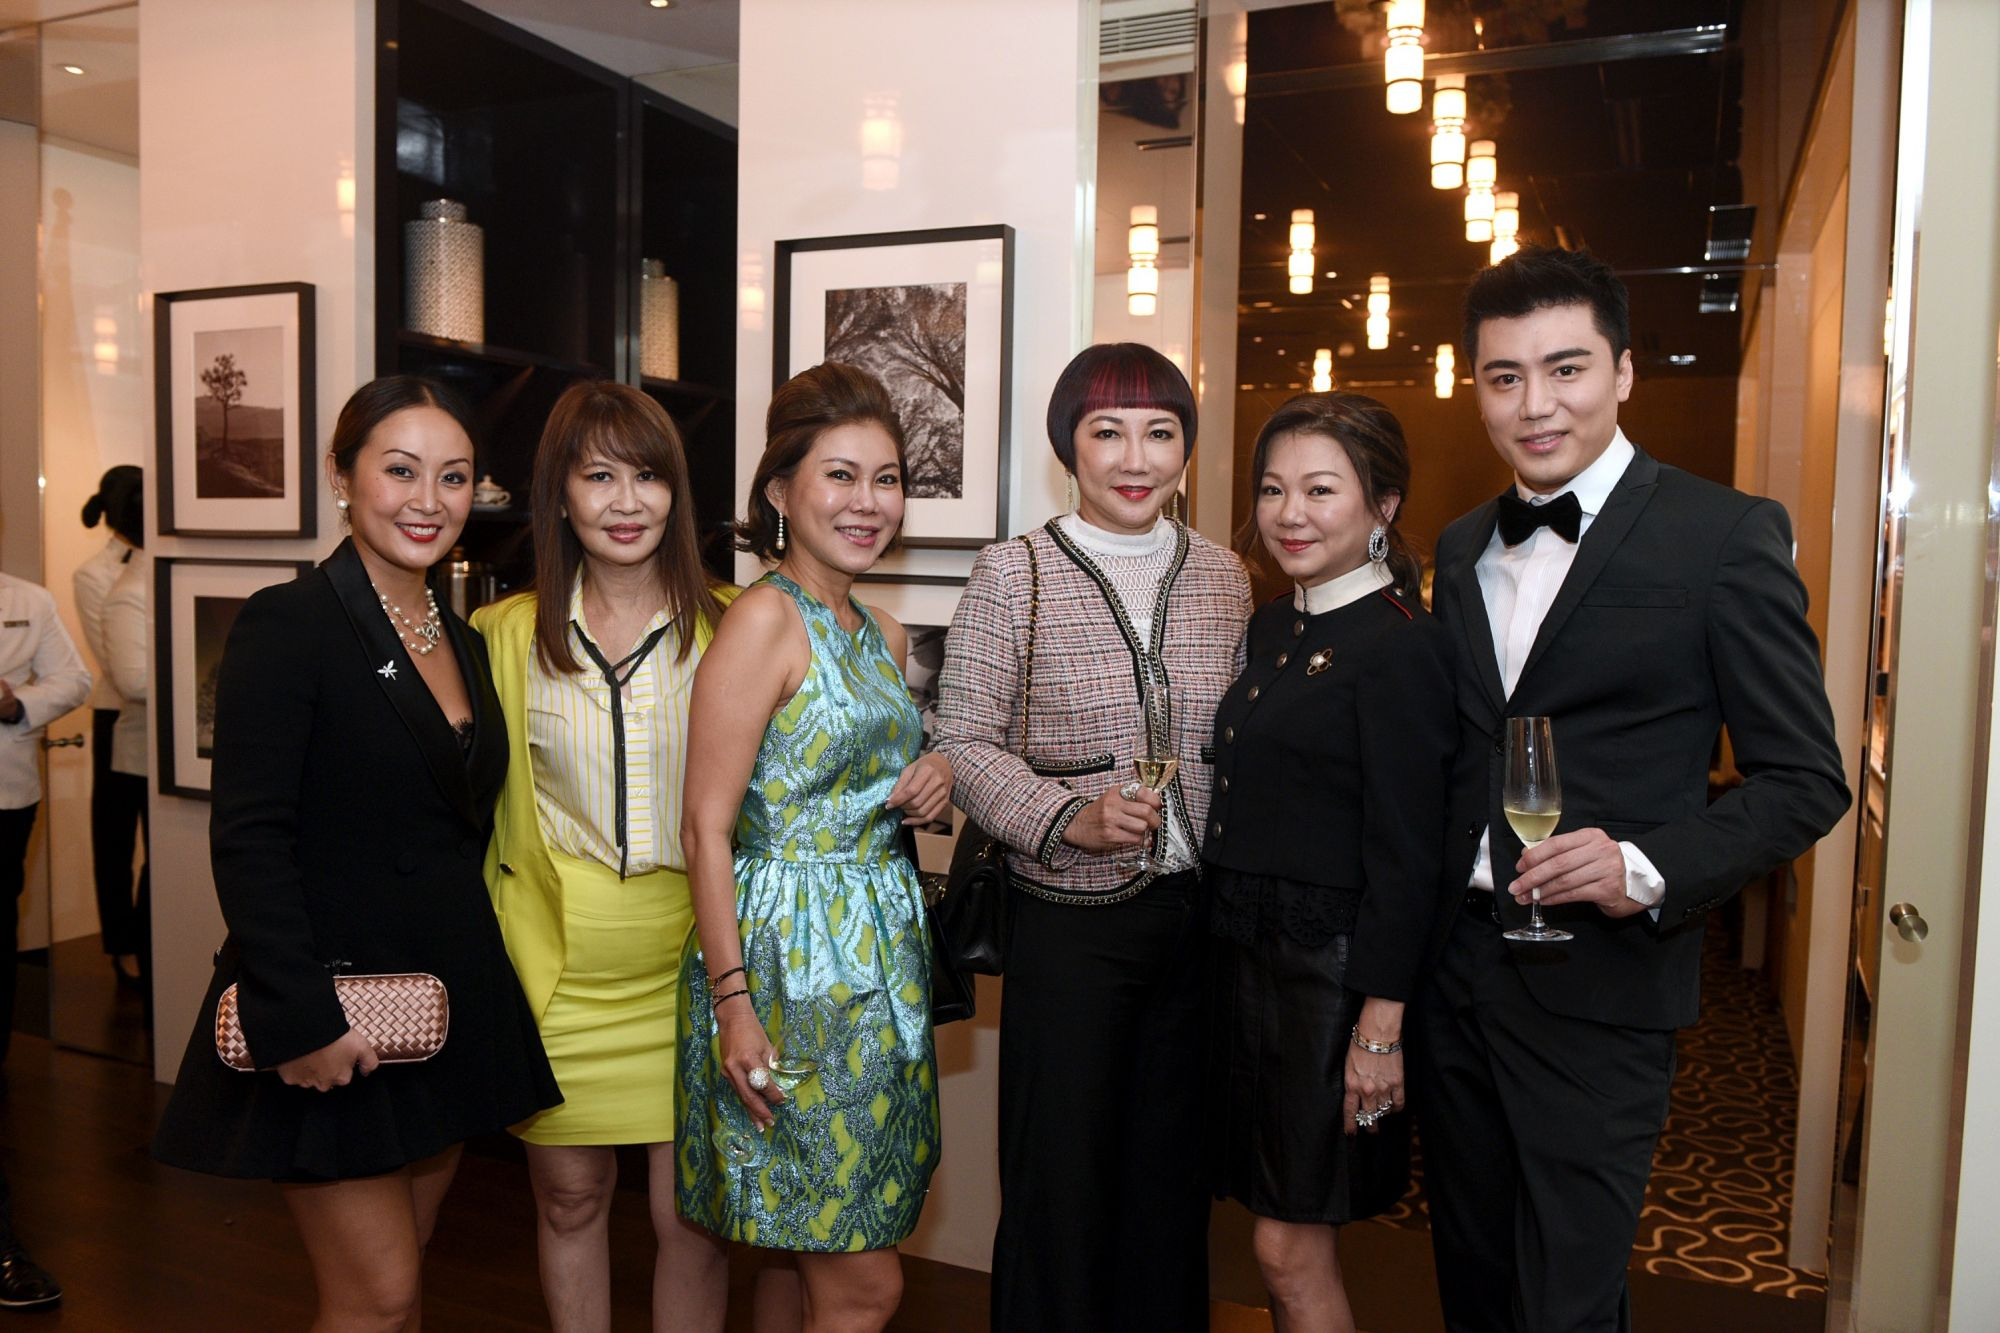 Serene Chua, Evelyn Sam, Sharon Lim, Frances Low, Angela Ng, Benjamin Khoh